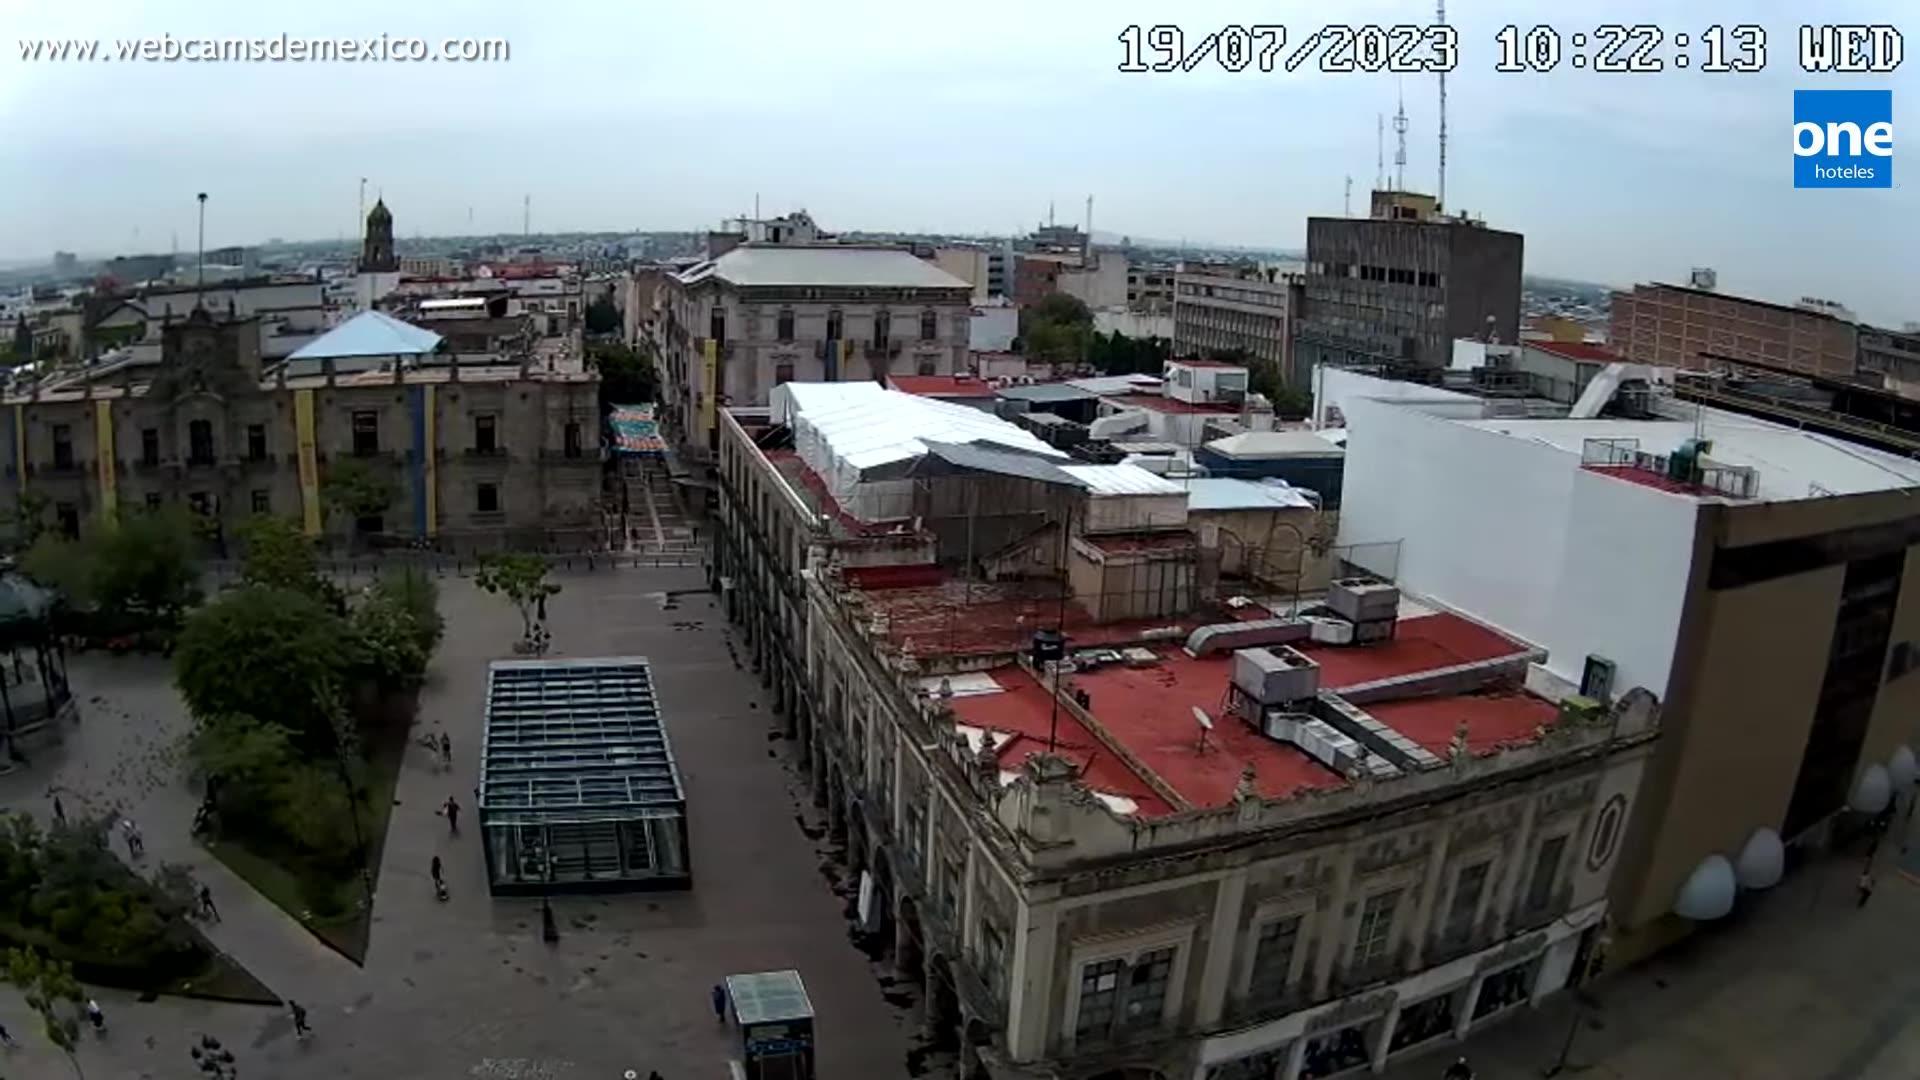 Webcam Guadalajara › North-East: Plaza de armas